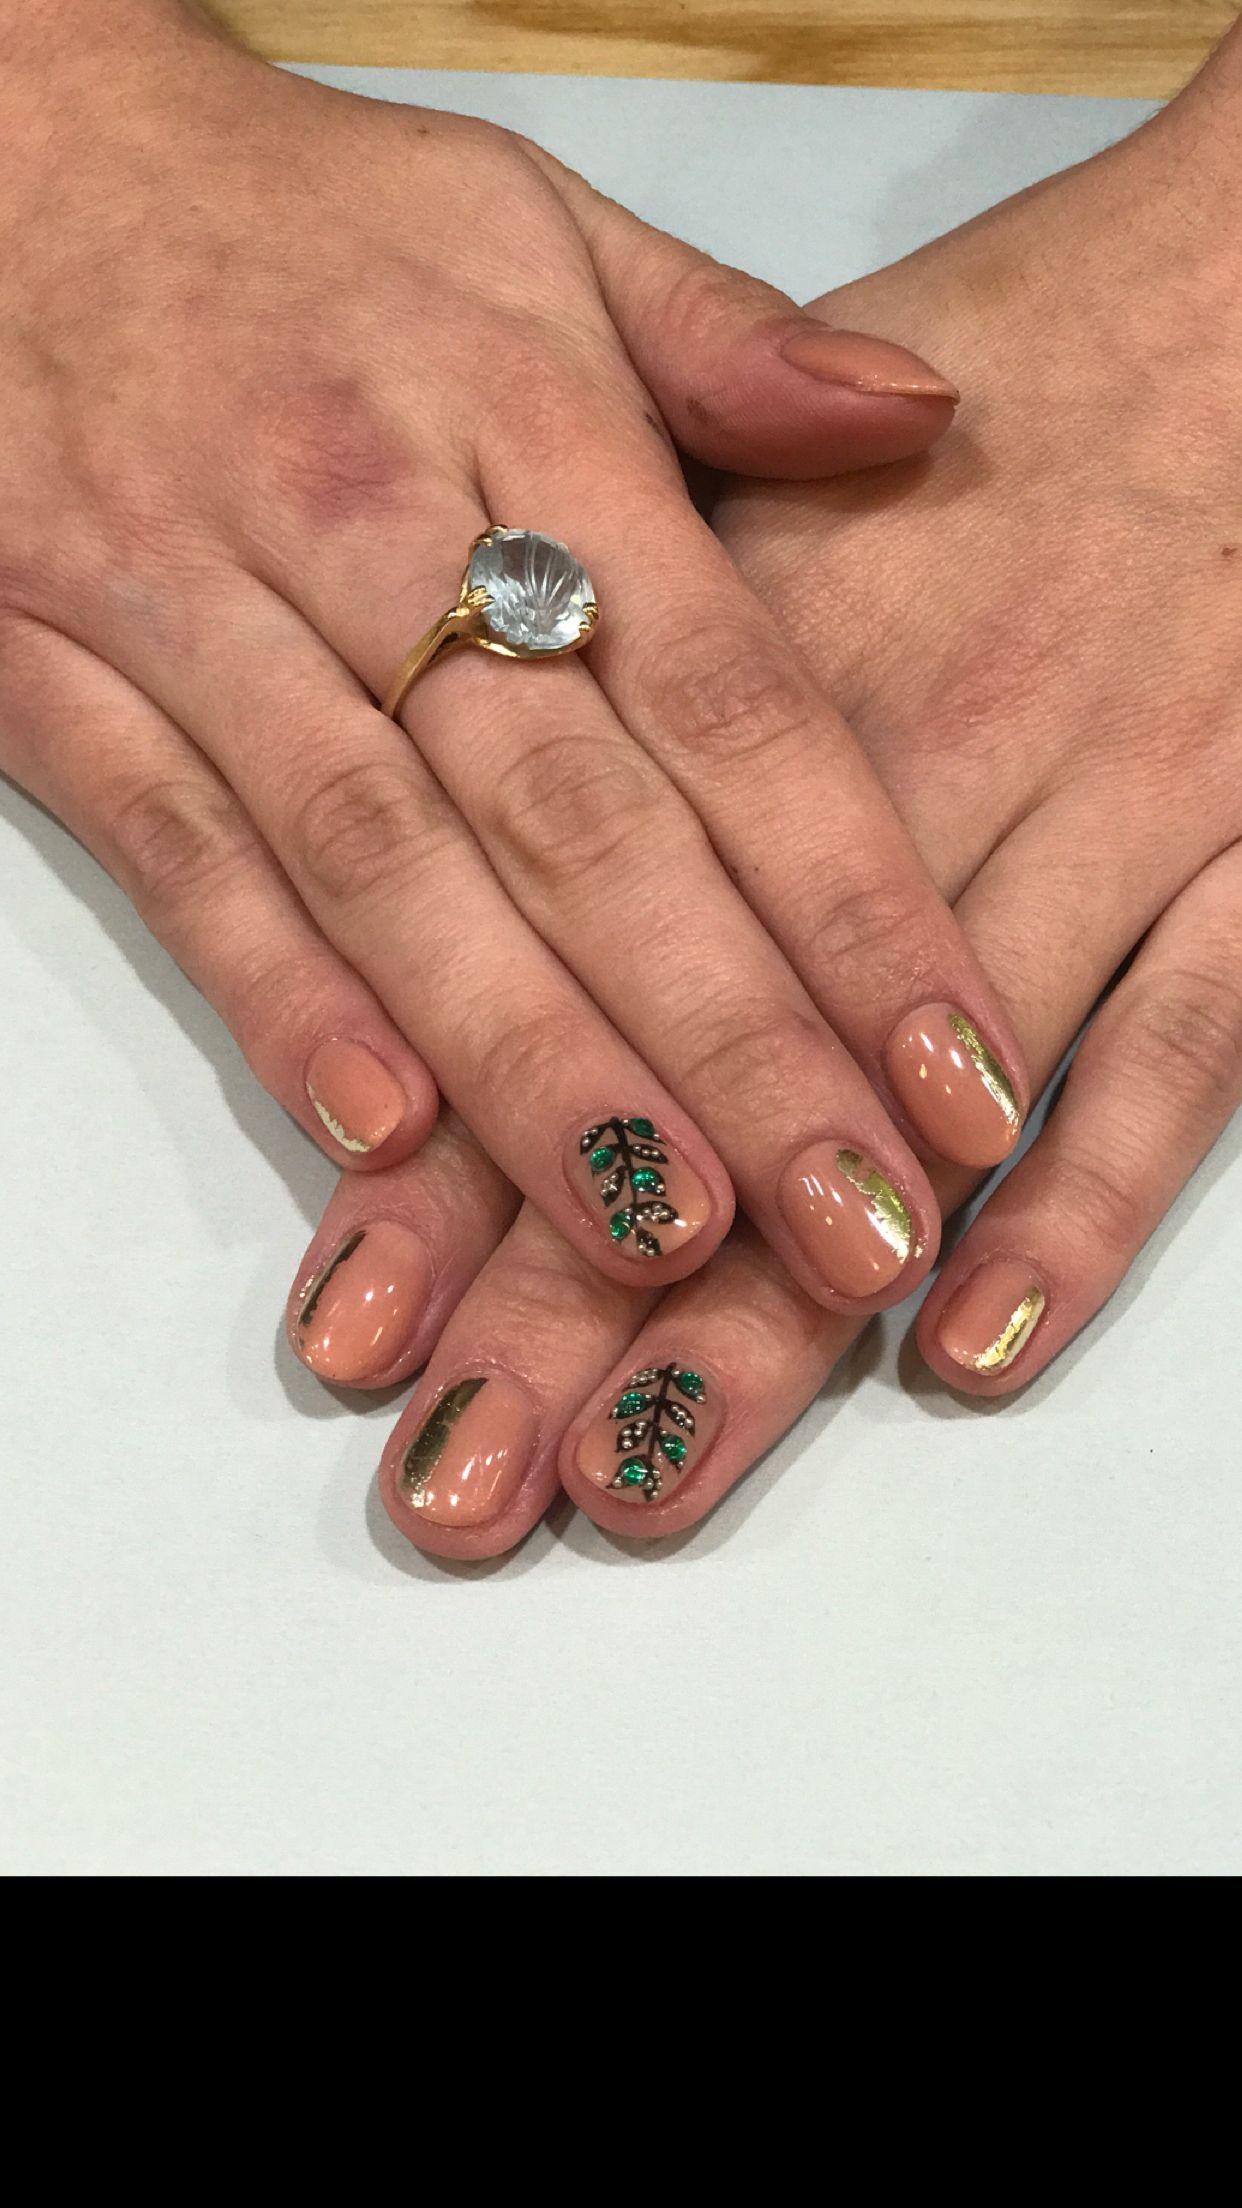 Gel mani with gold foil nail art! Gemstone nail designs! Follow ...